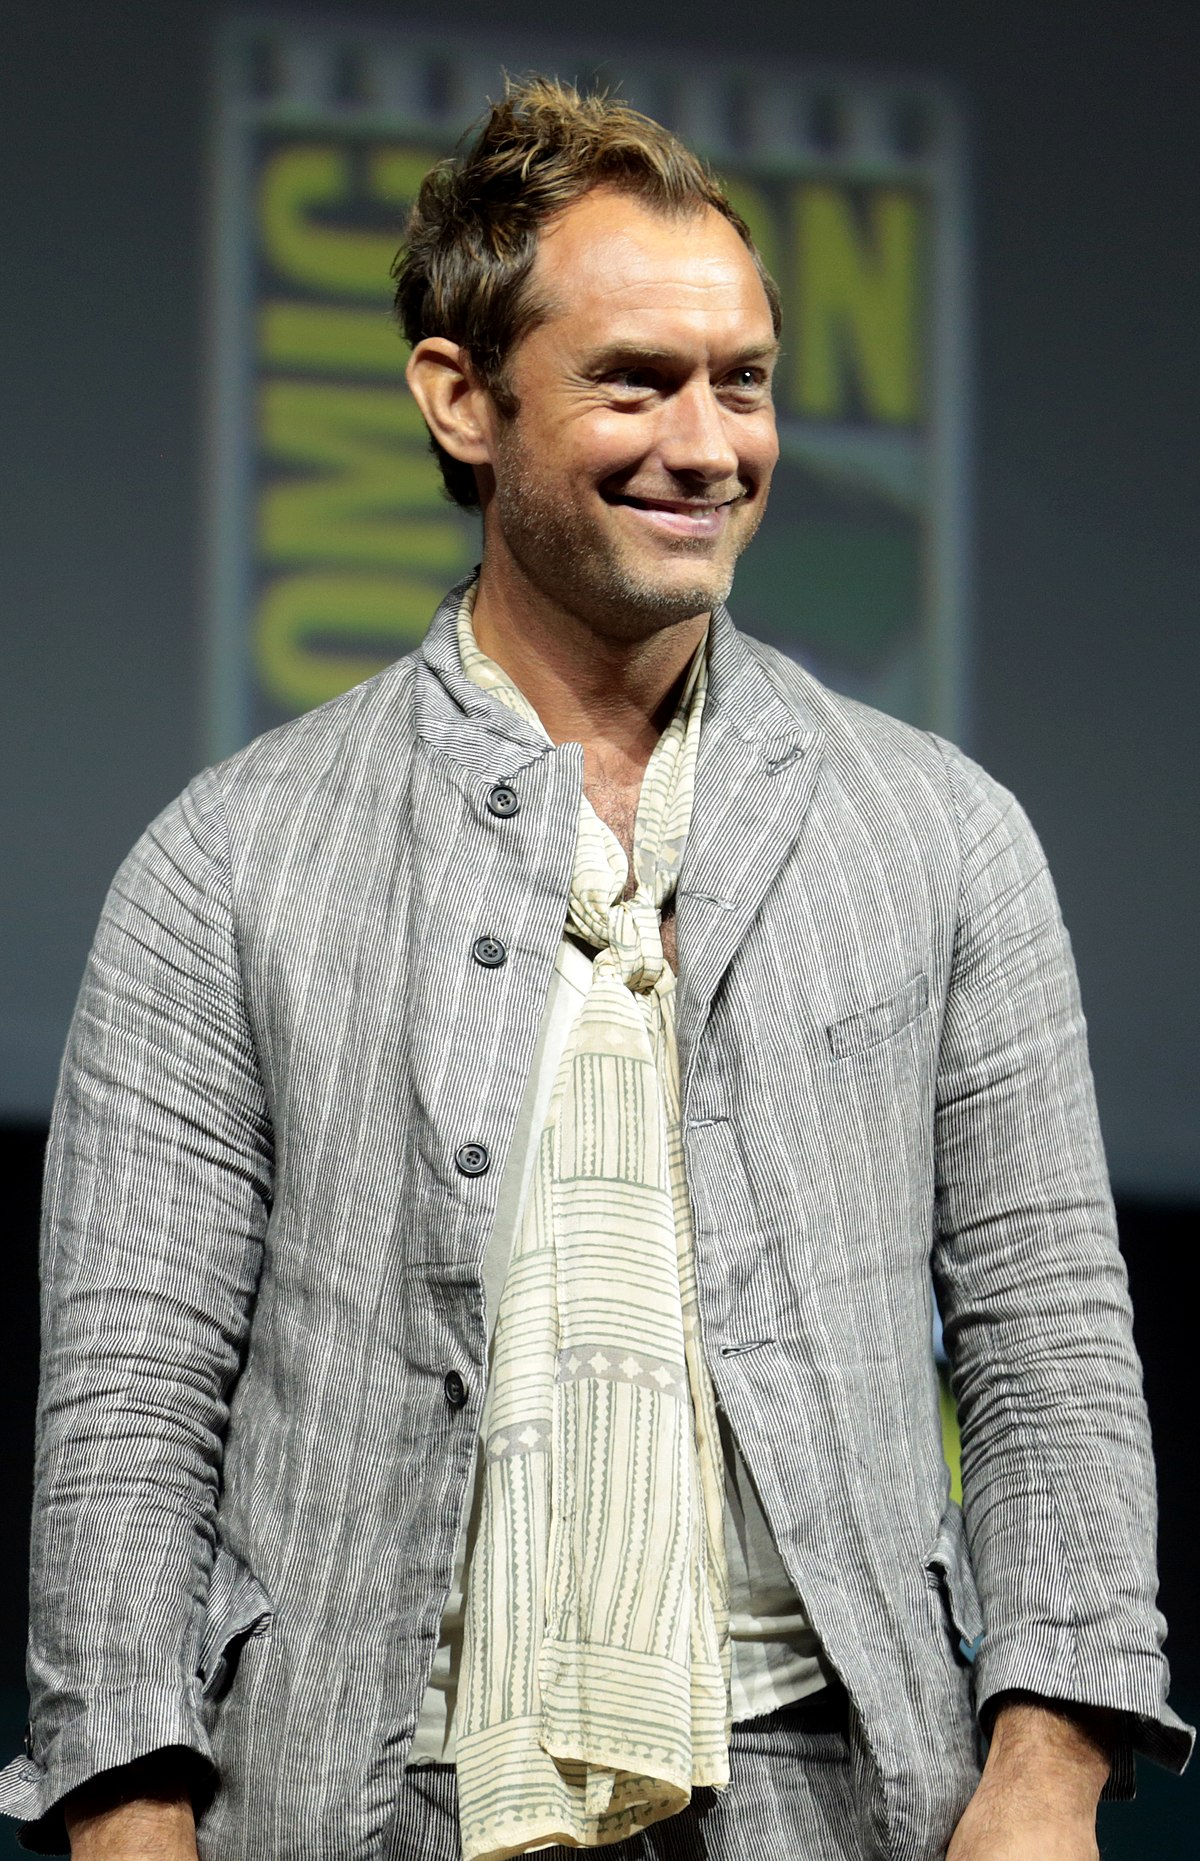 Jude Law - Wikipedia